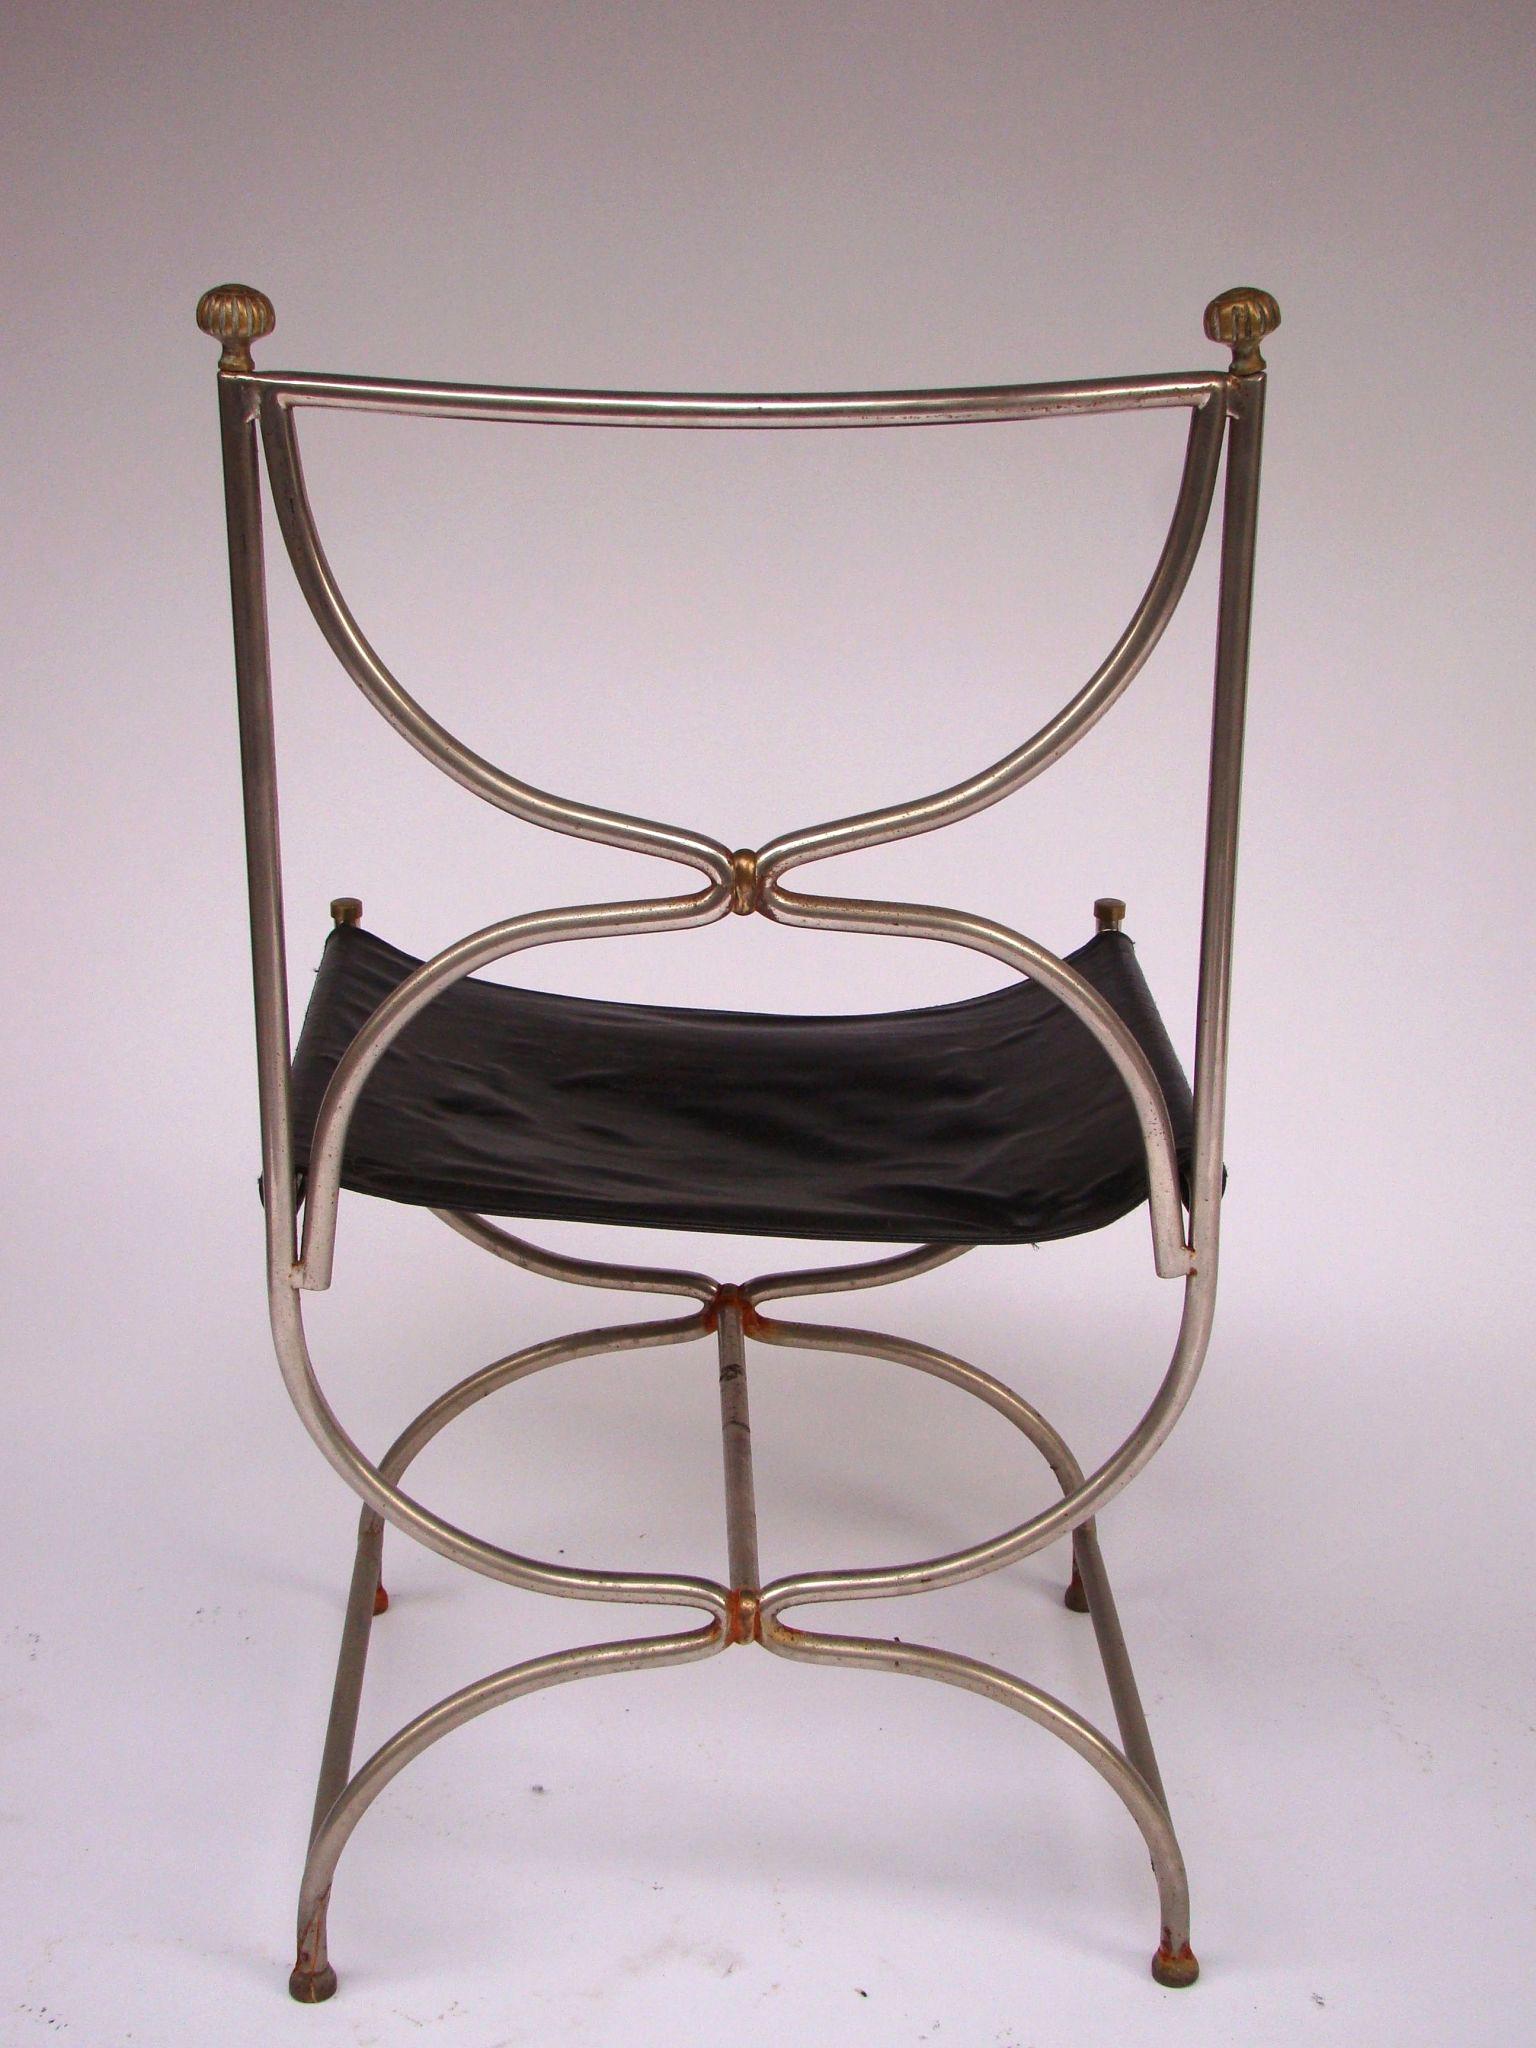 salon de jardin en metal le meilleur de salon de jardin acier et meuble en acier unique meuble atelier 0d of salon de jardin en metal